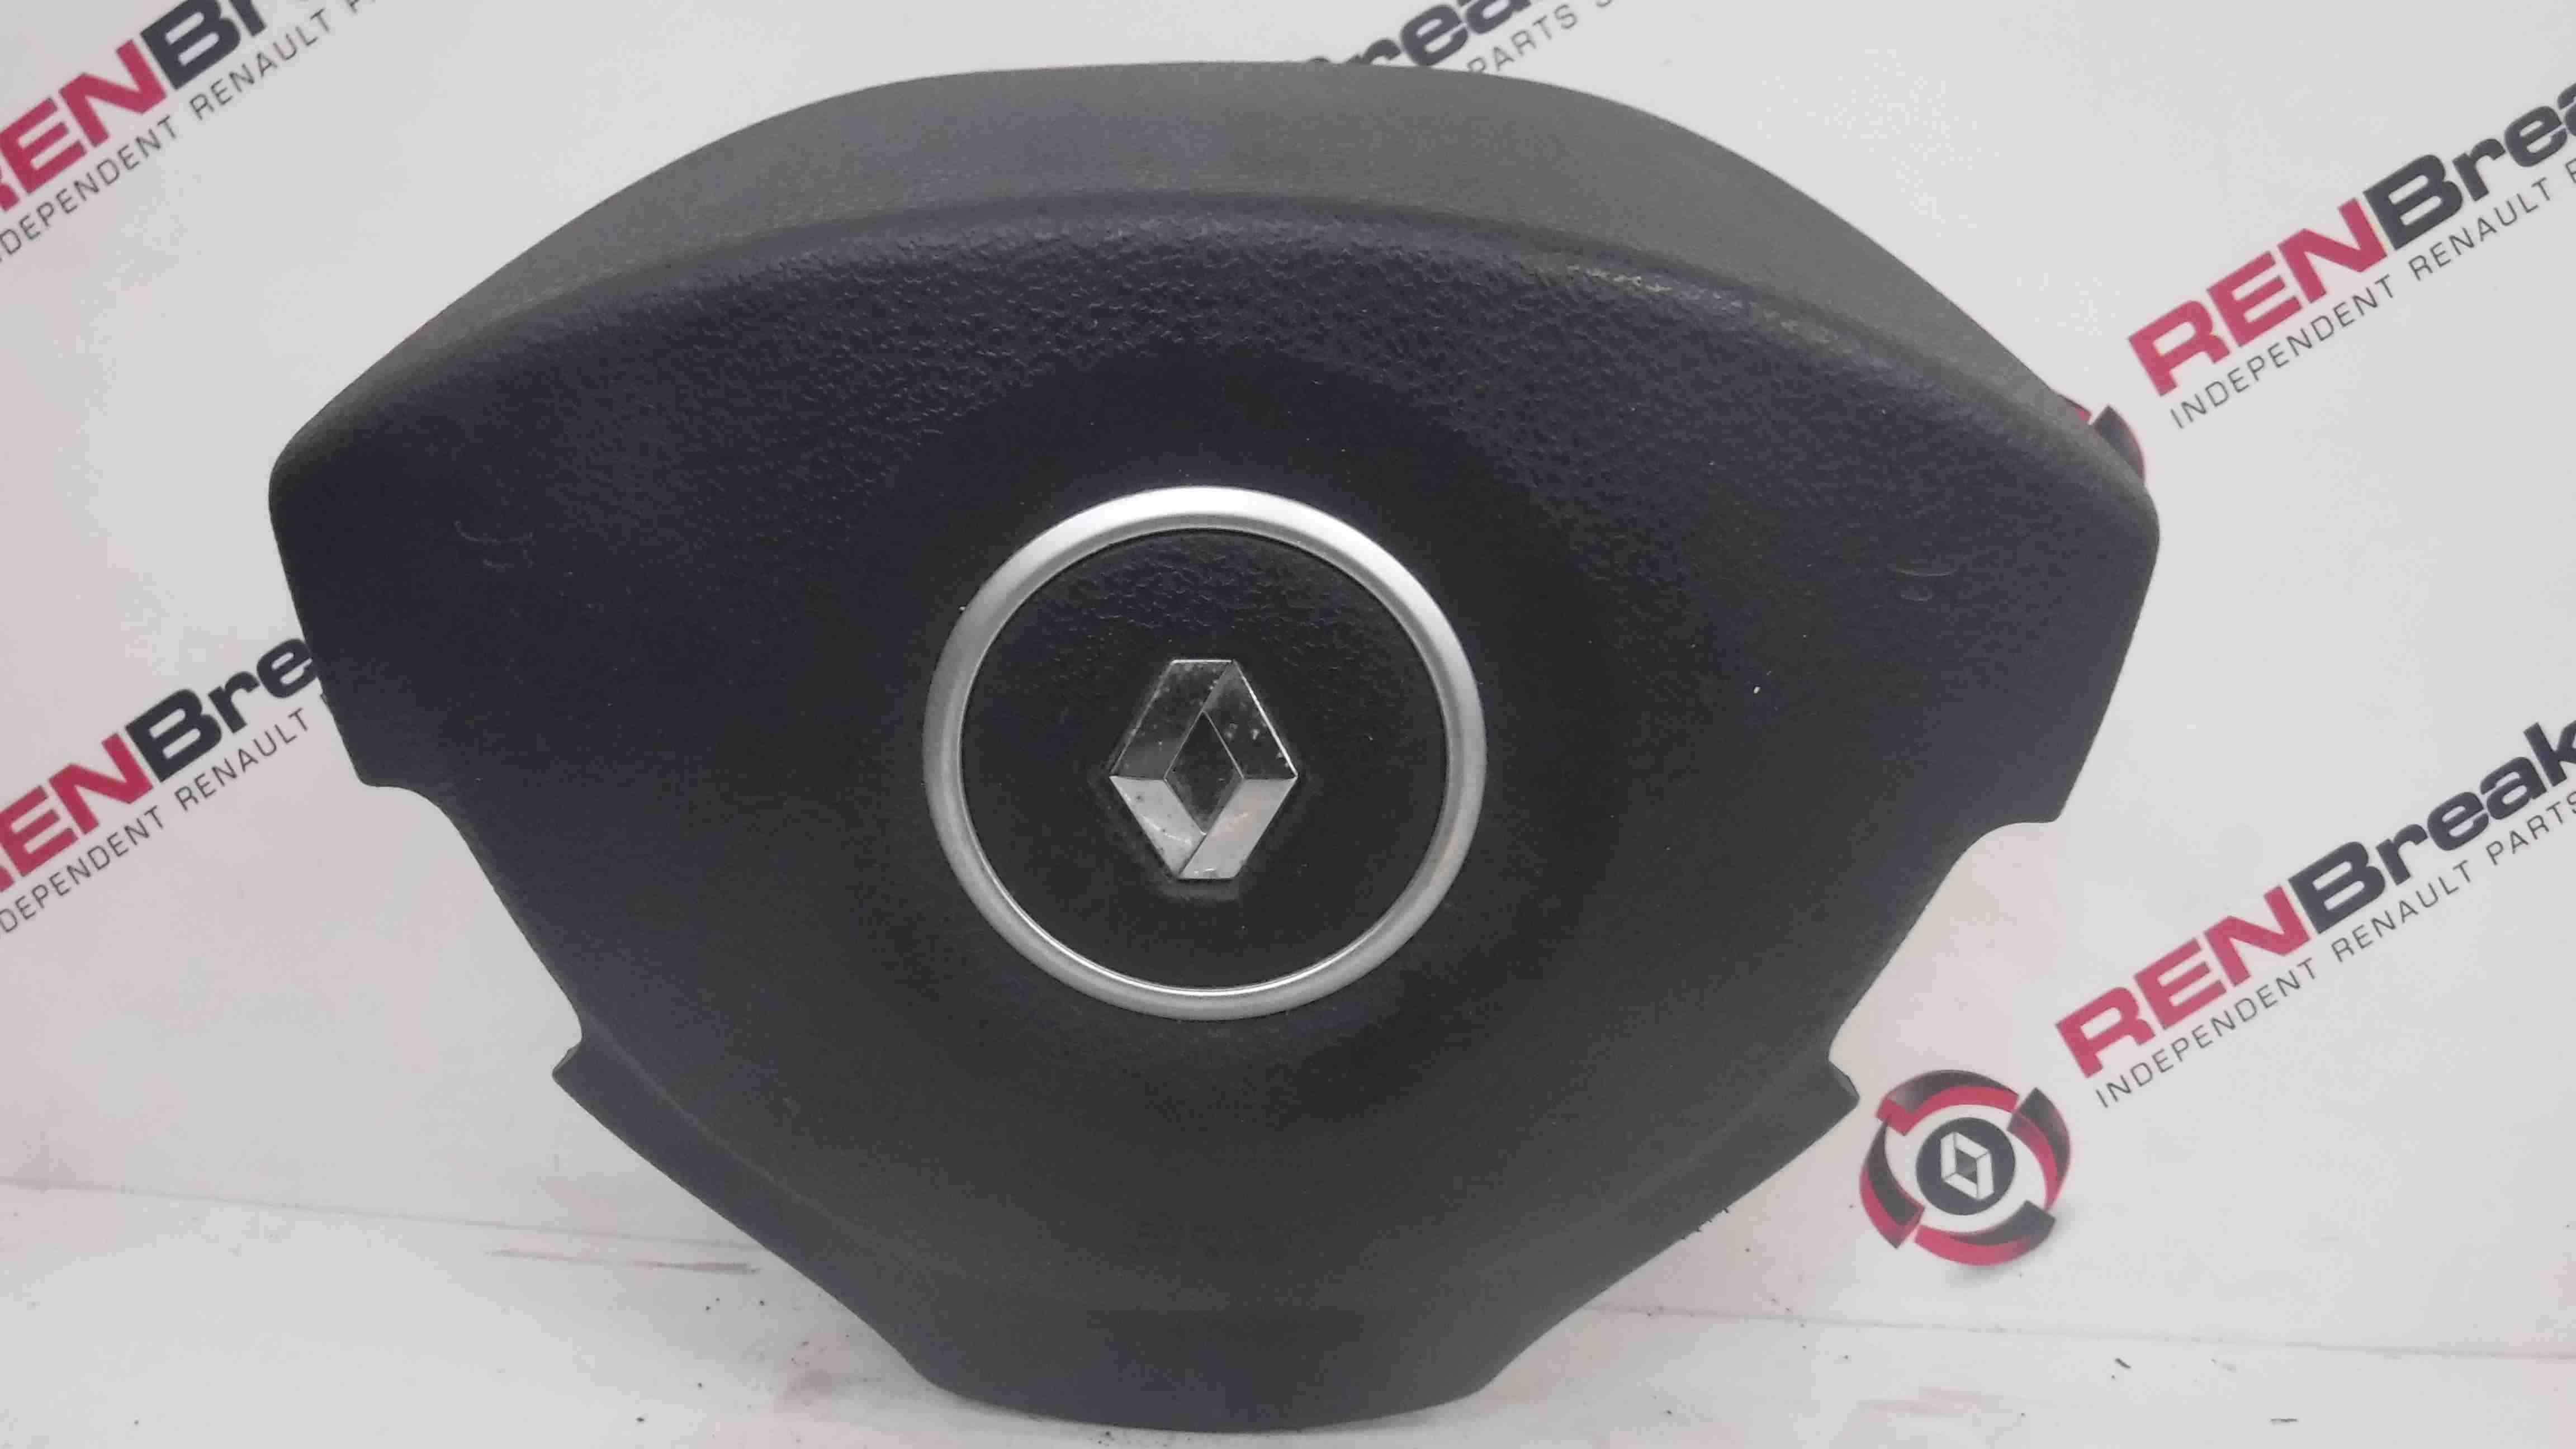 Renault Modus 2004-2008 Steering Wheel Airbag Cruise Control 8200591702